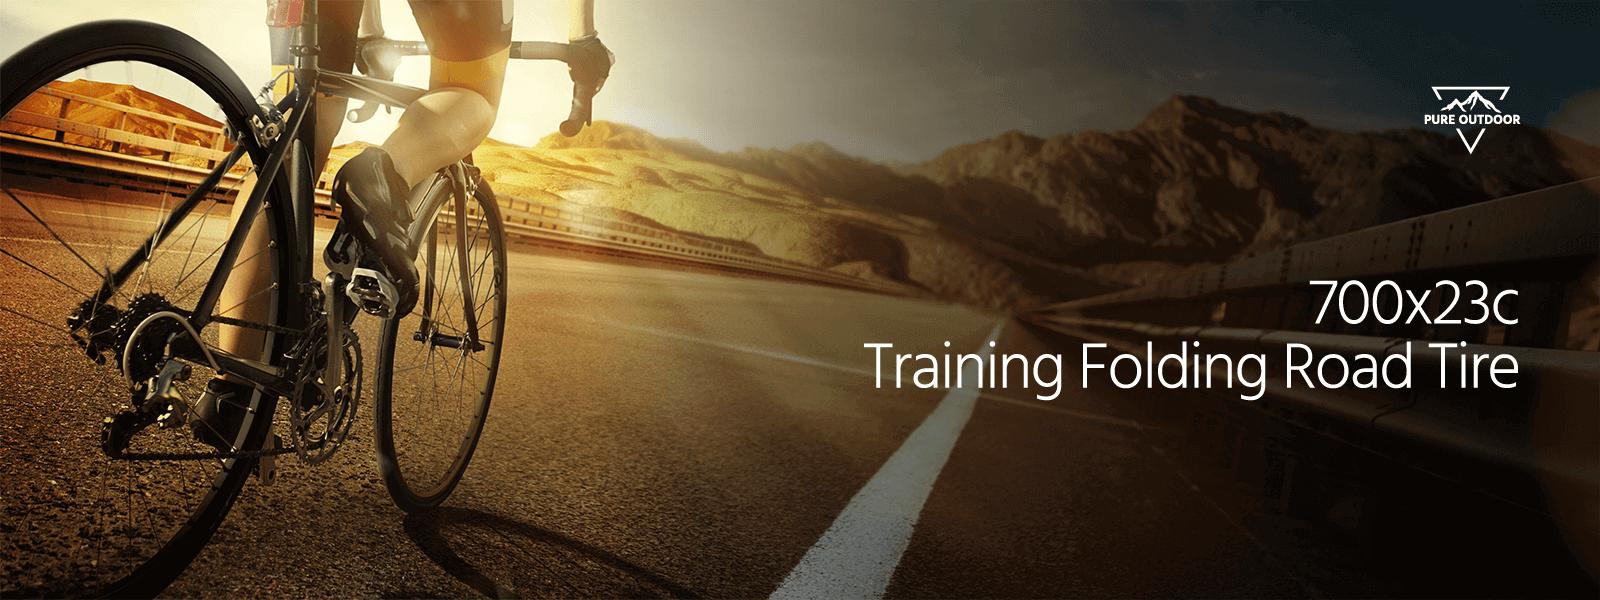 Training Folding Road Tire